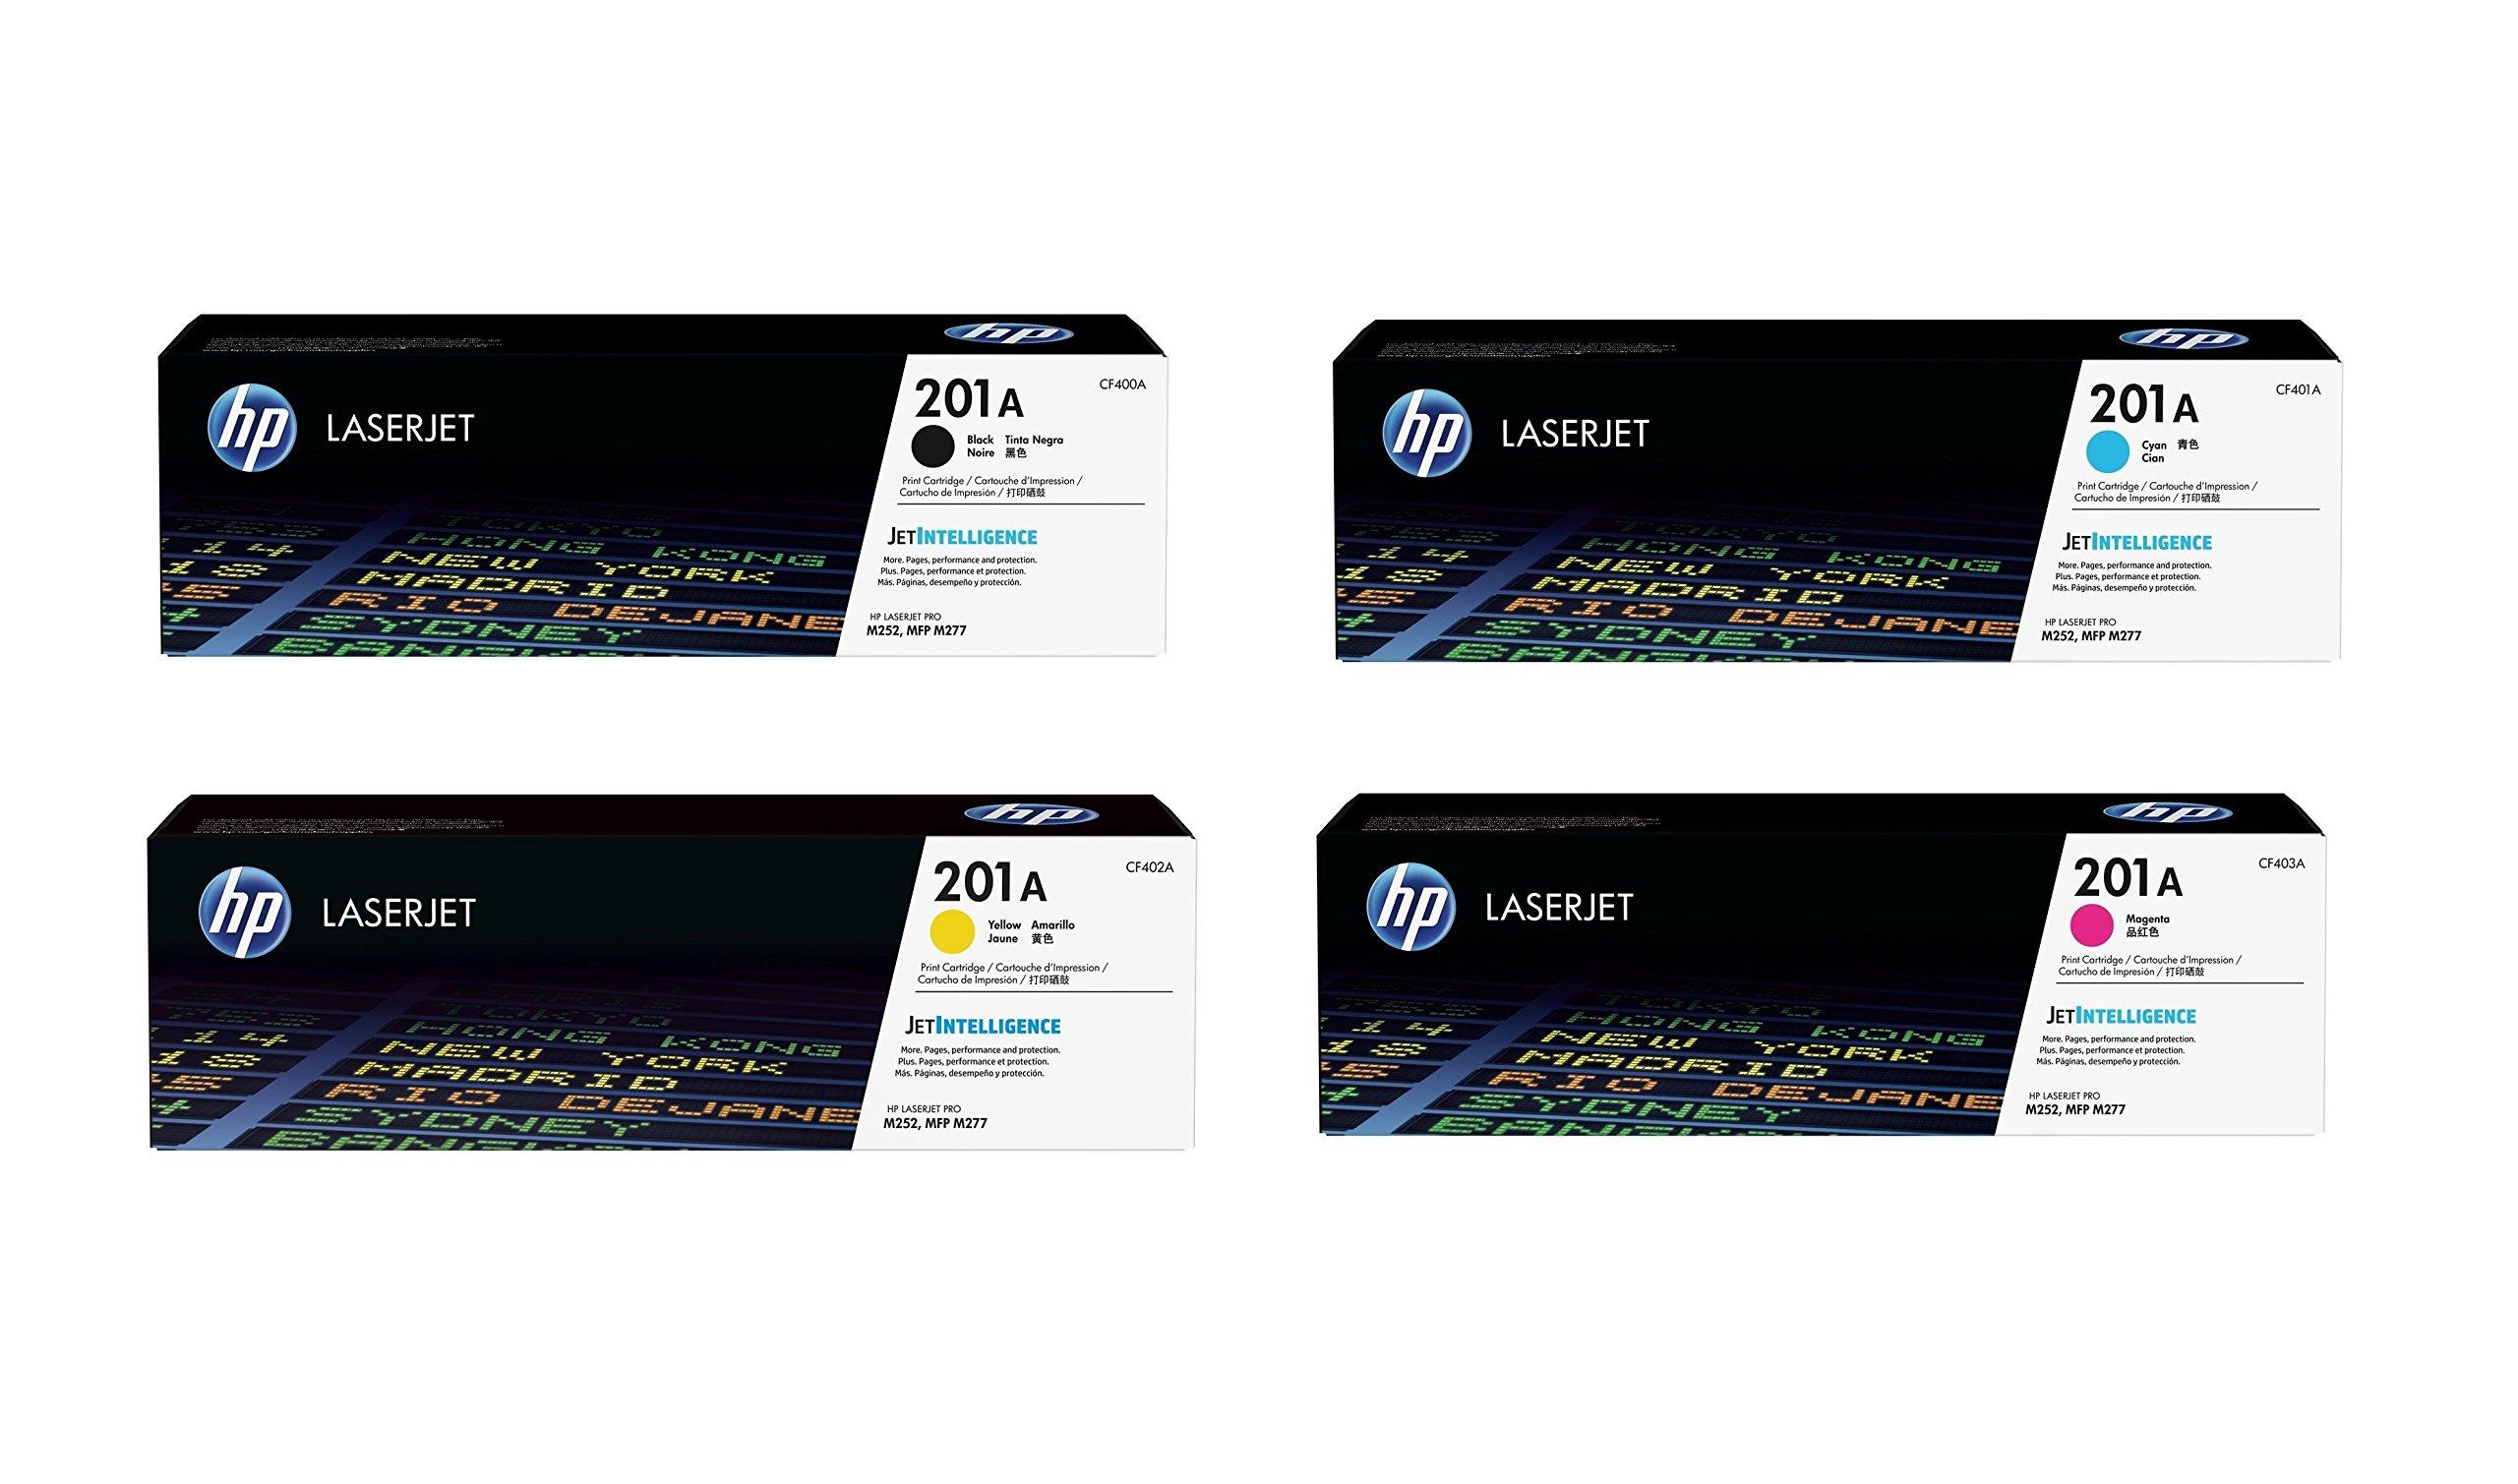 HP 201A BCYM Original LaserJet Toner Cartridge Set - Black, Cyan, Yellow, Magenta (CF400A, CF401A, CF402A, CF403A) - for LaserJet M277dn/M277dw Pro M252dn/M252dw Sealed in Retail Packaging